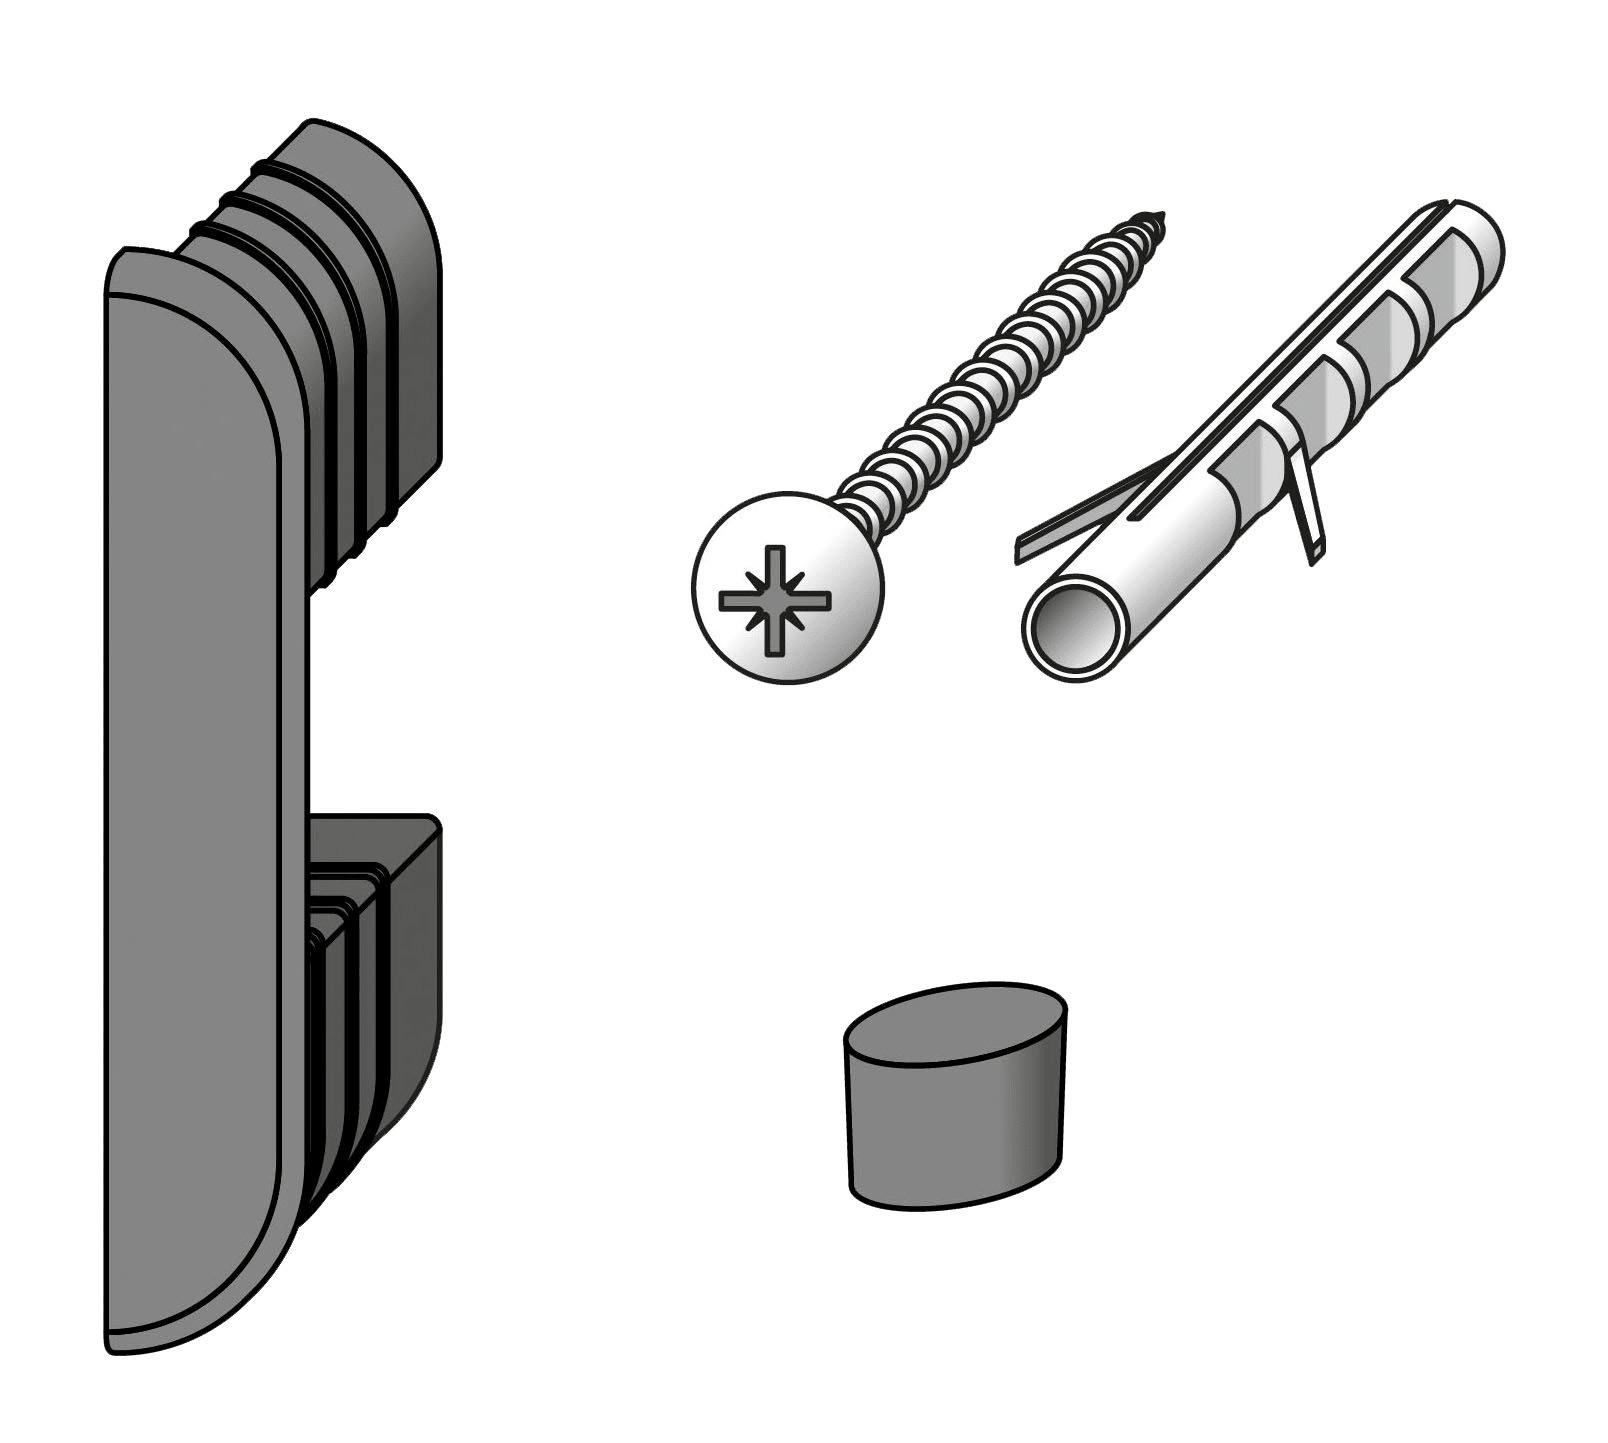 alfer coaxis®-Wand-Befestigungs-Set